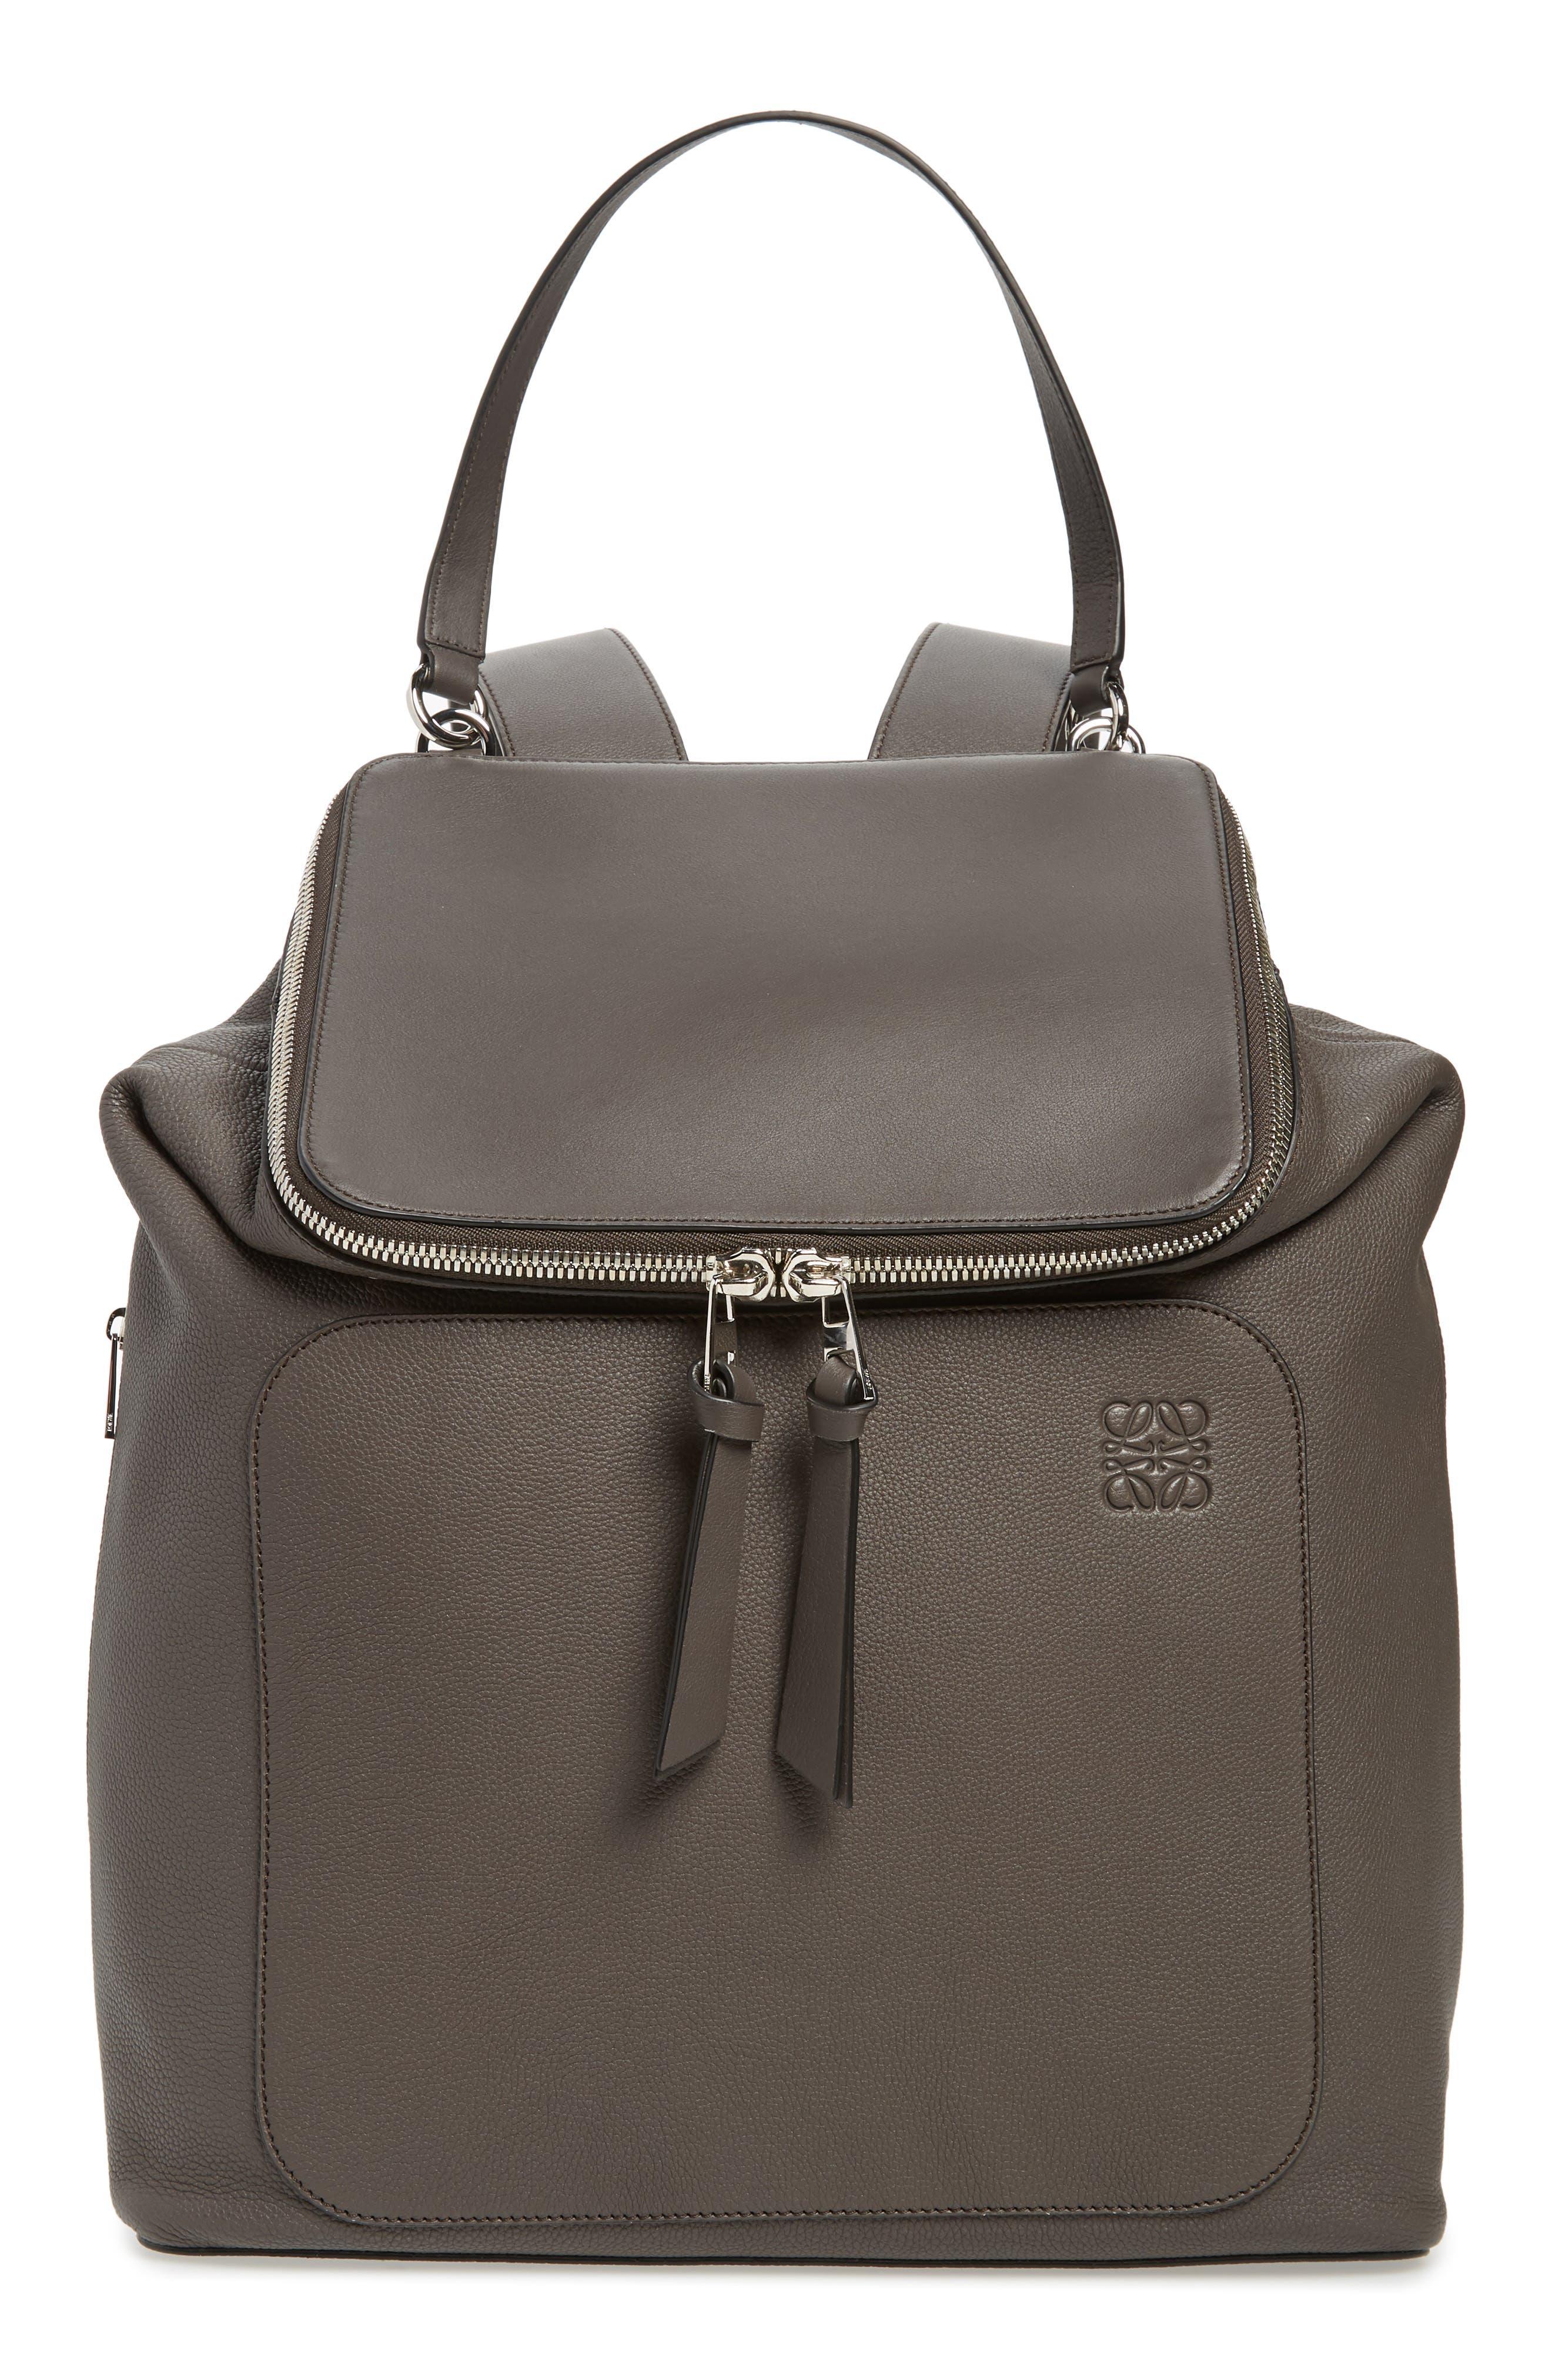 Goya Plaid Calfskin Leather Backpack,                         Main,                         color, 022